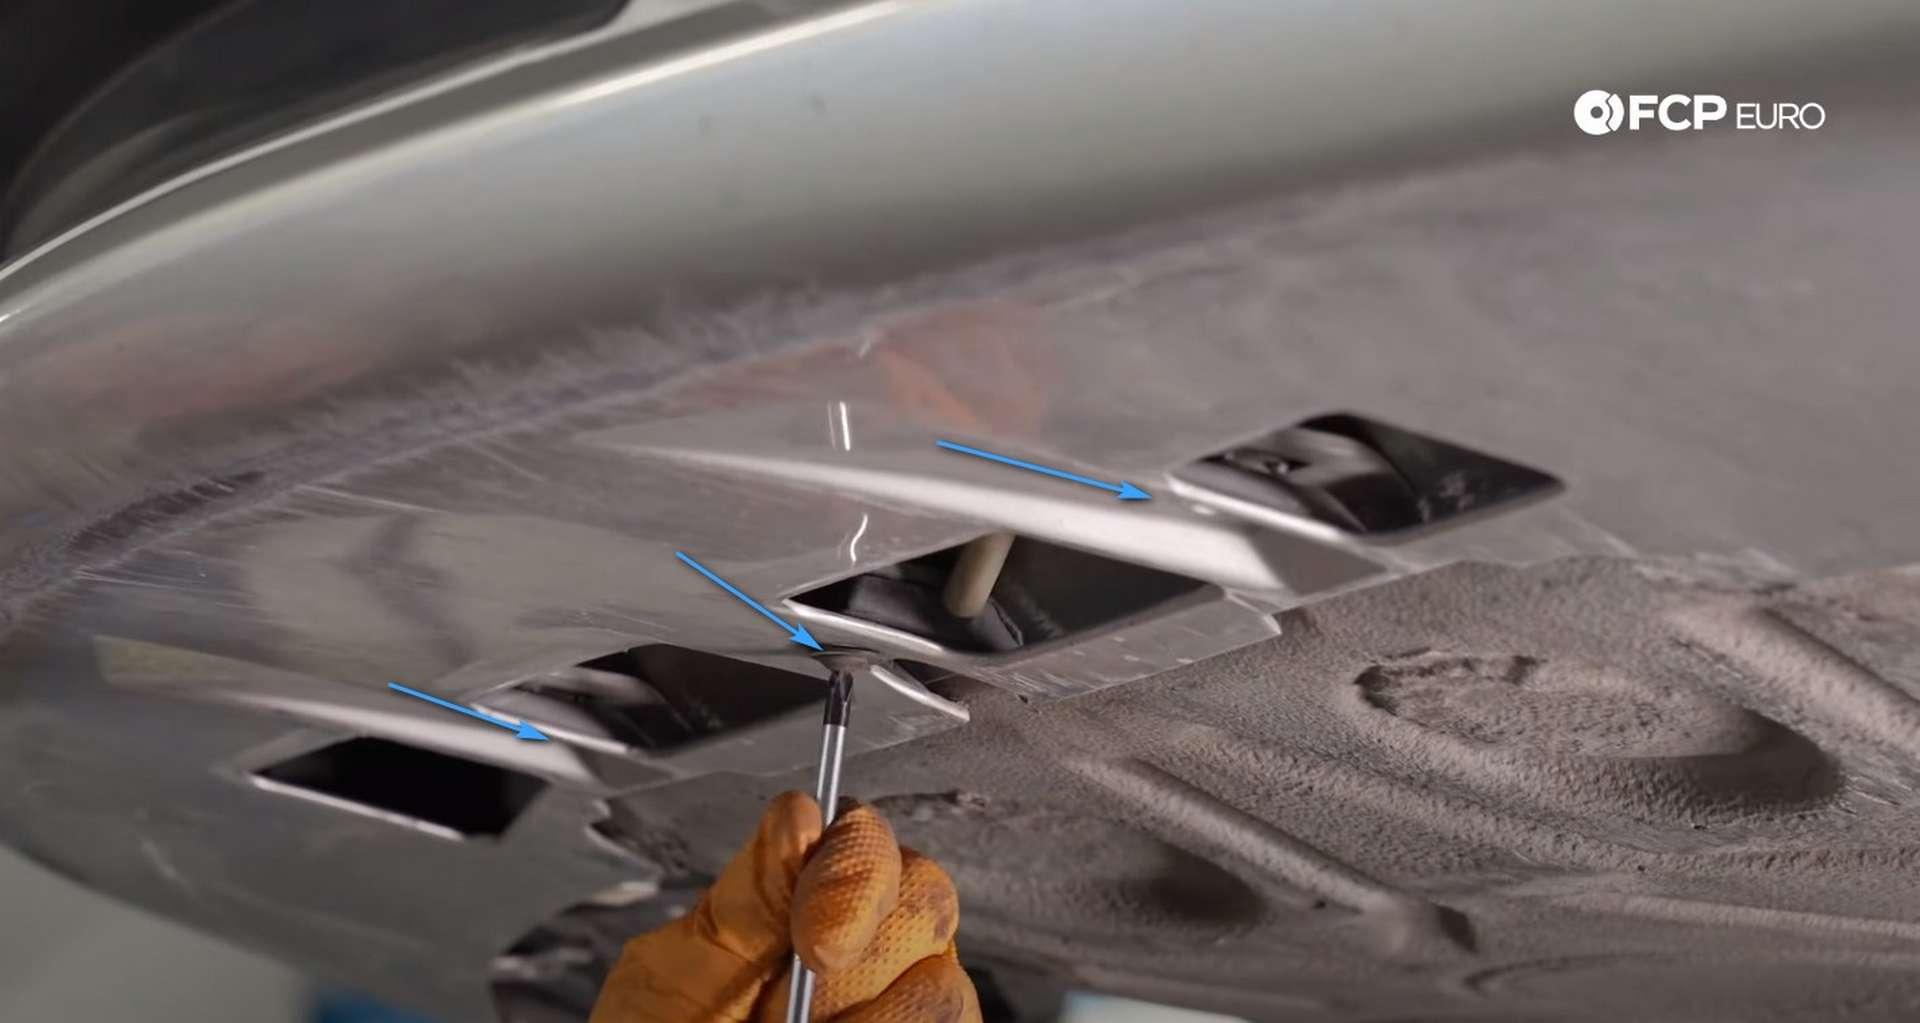 DIY Porsche 996 Radiator Replacement remaining bumper cover screws